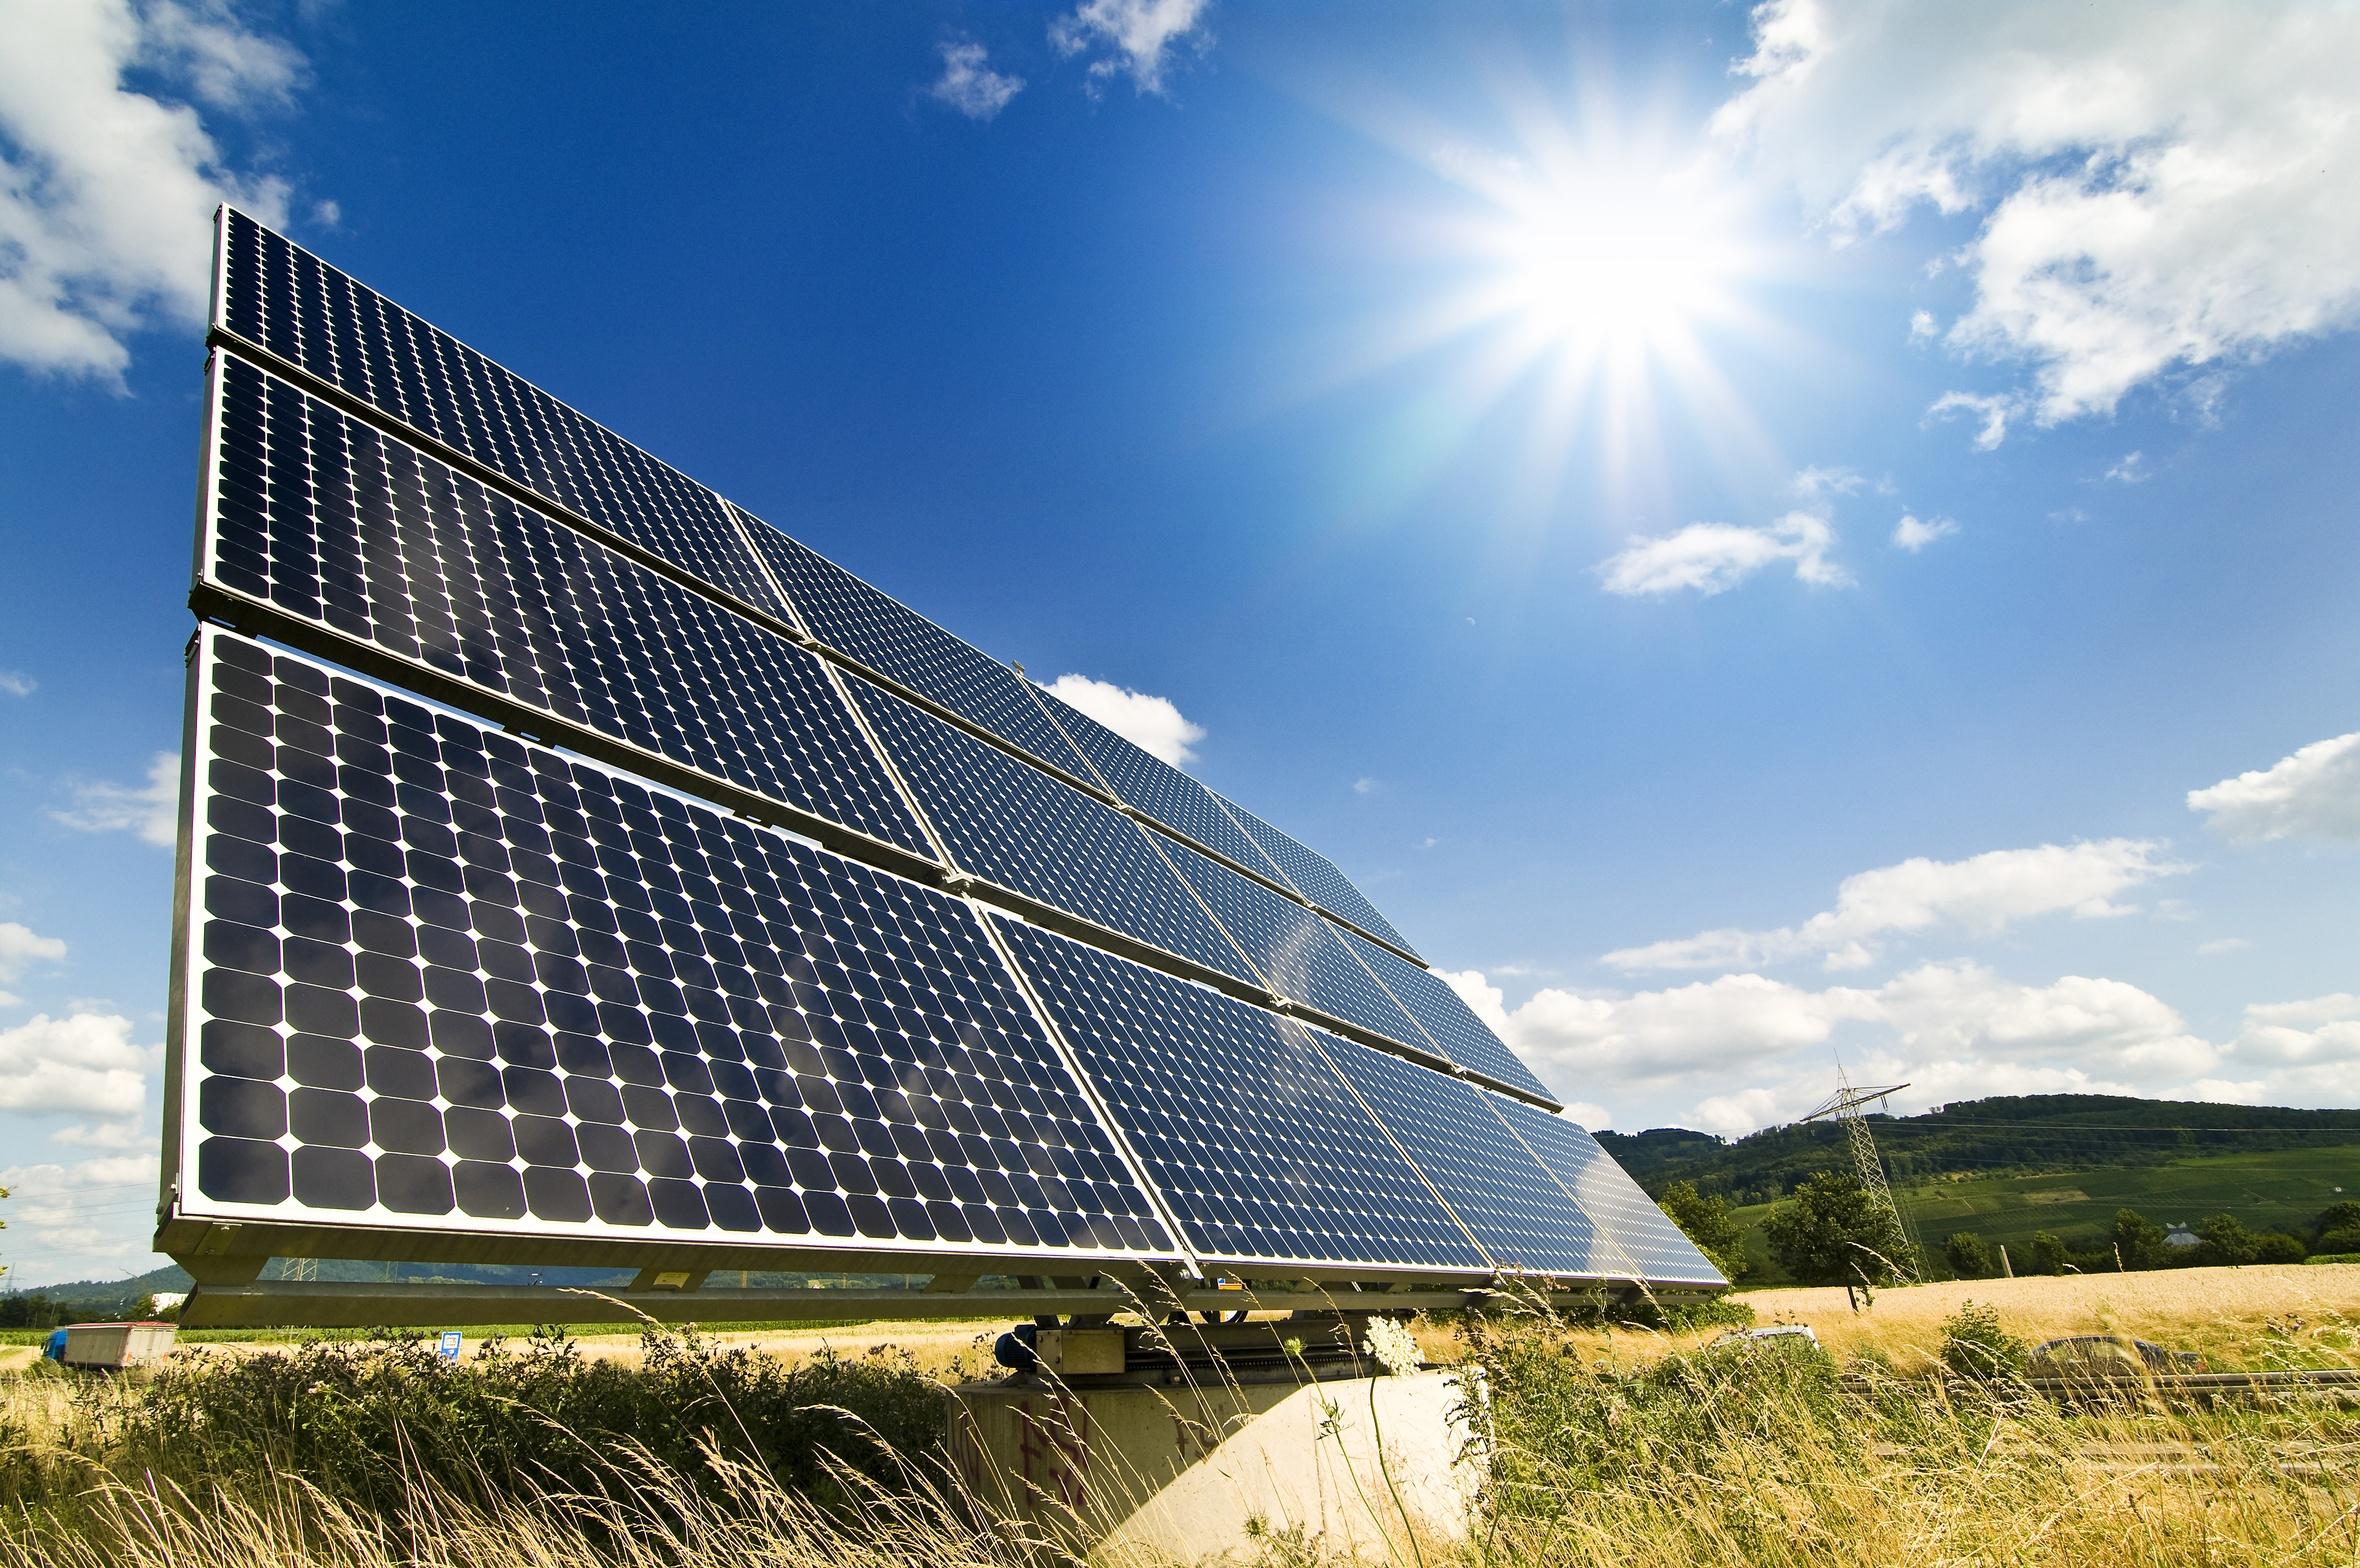 Erneuerbare Energien - Energieberatung Industrie